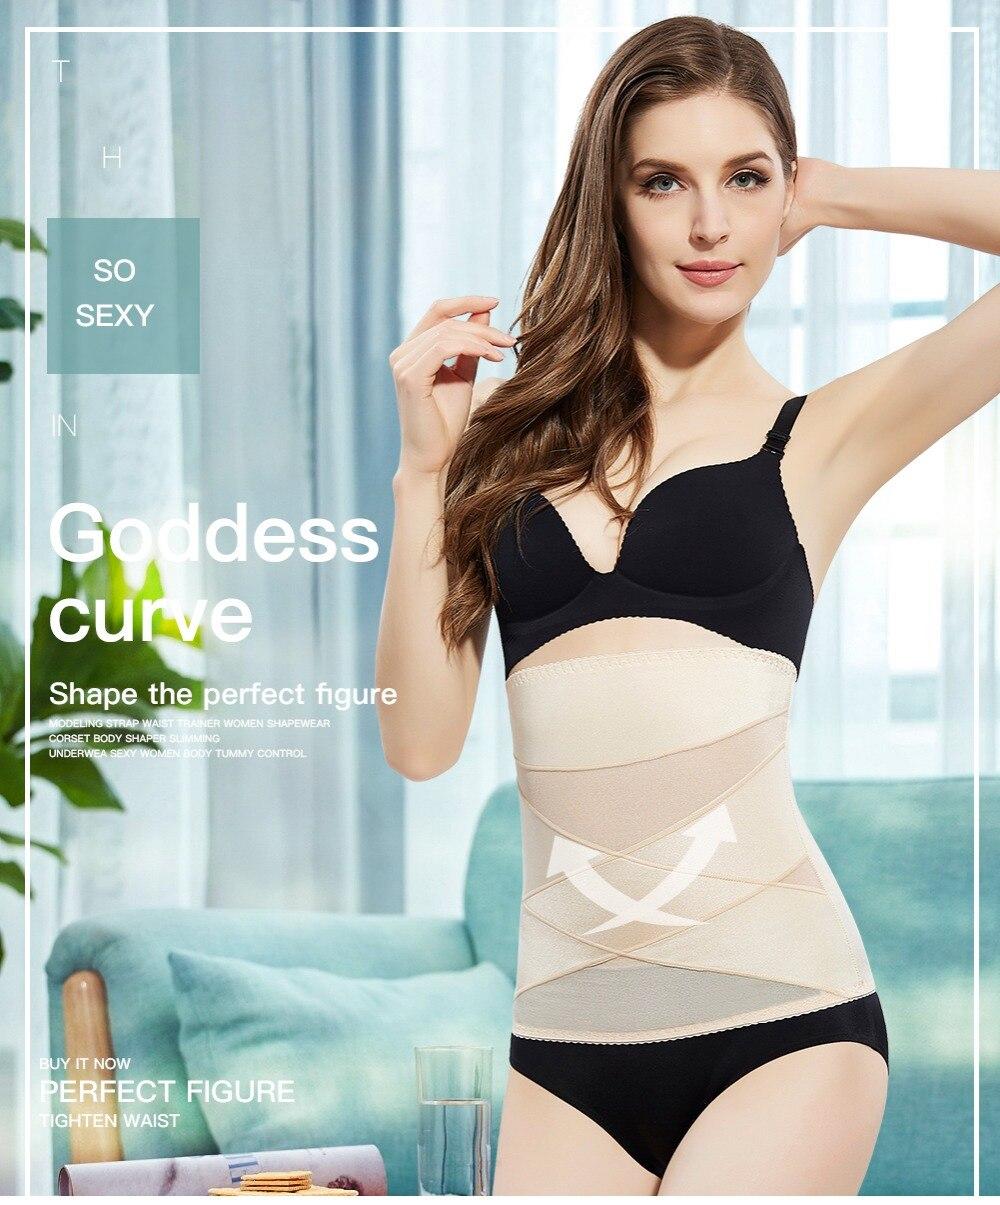 Slimming Belt Waist Trainer Slimming Underwear Modeling Strap High ... e06fc0985